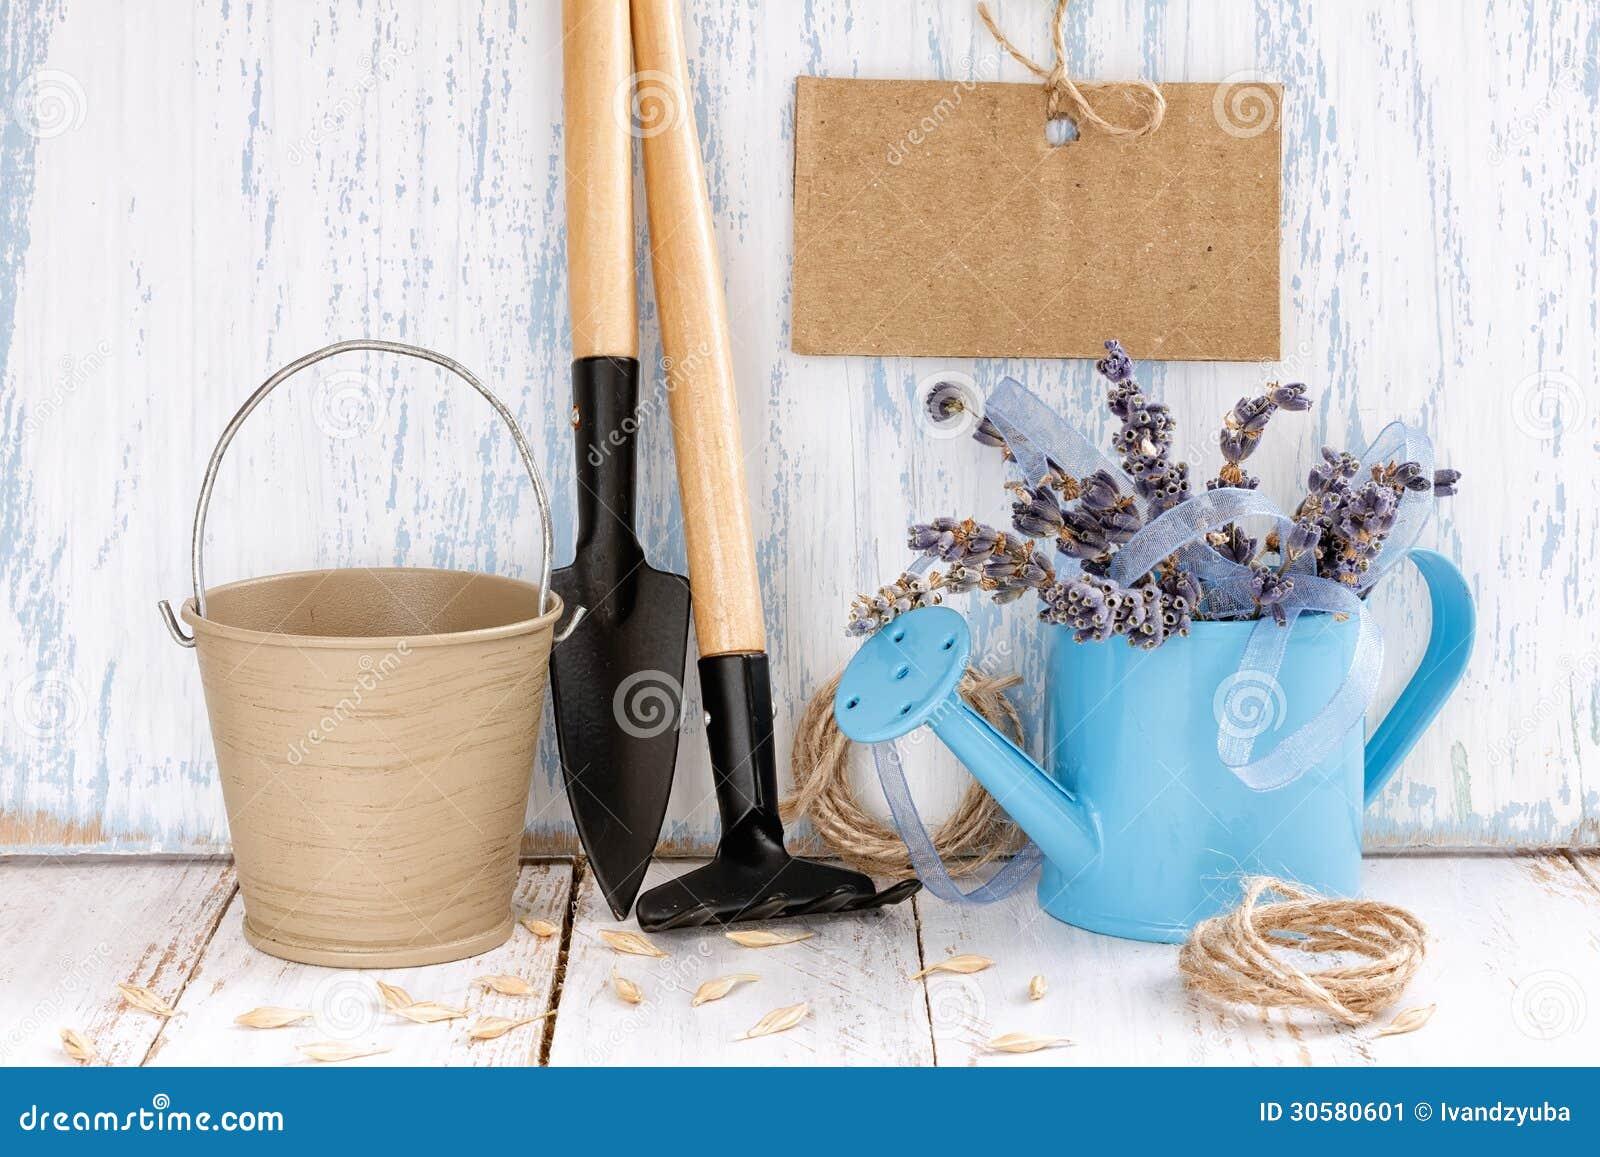 Gardening tools stock image image 30580601 for Gardening tools watering